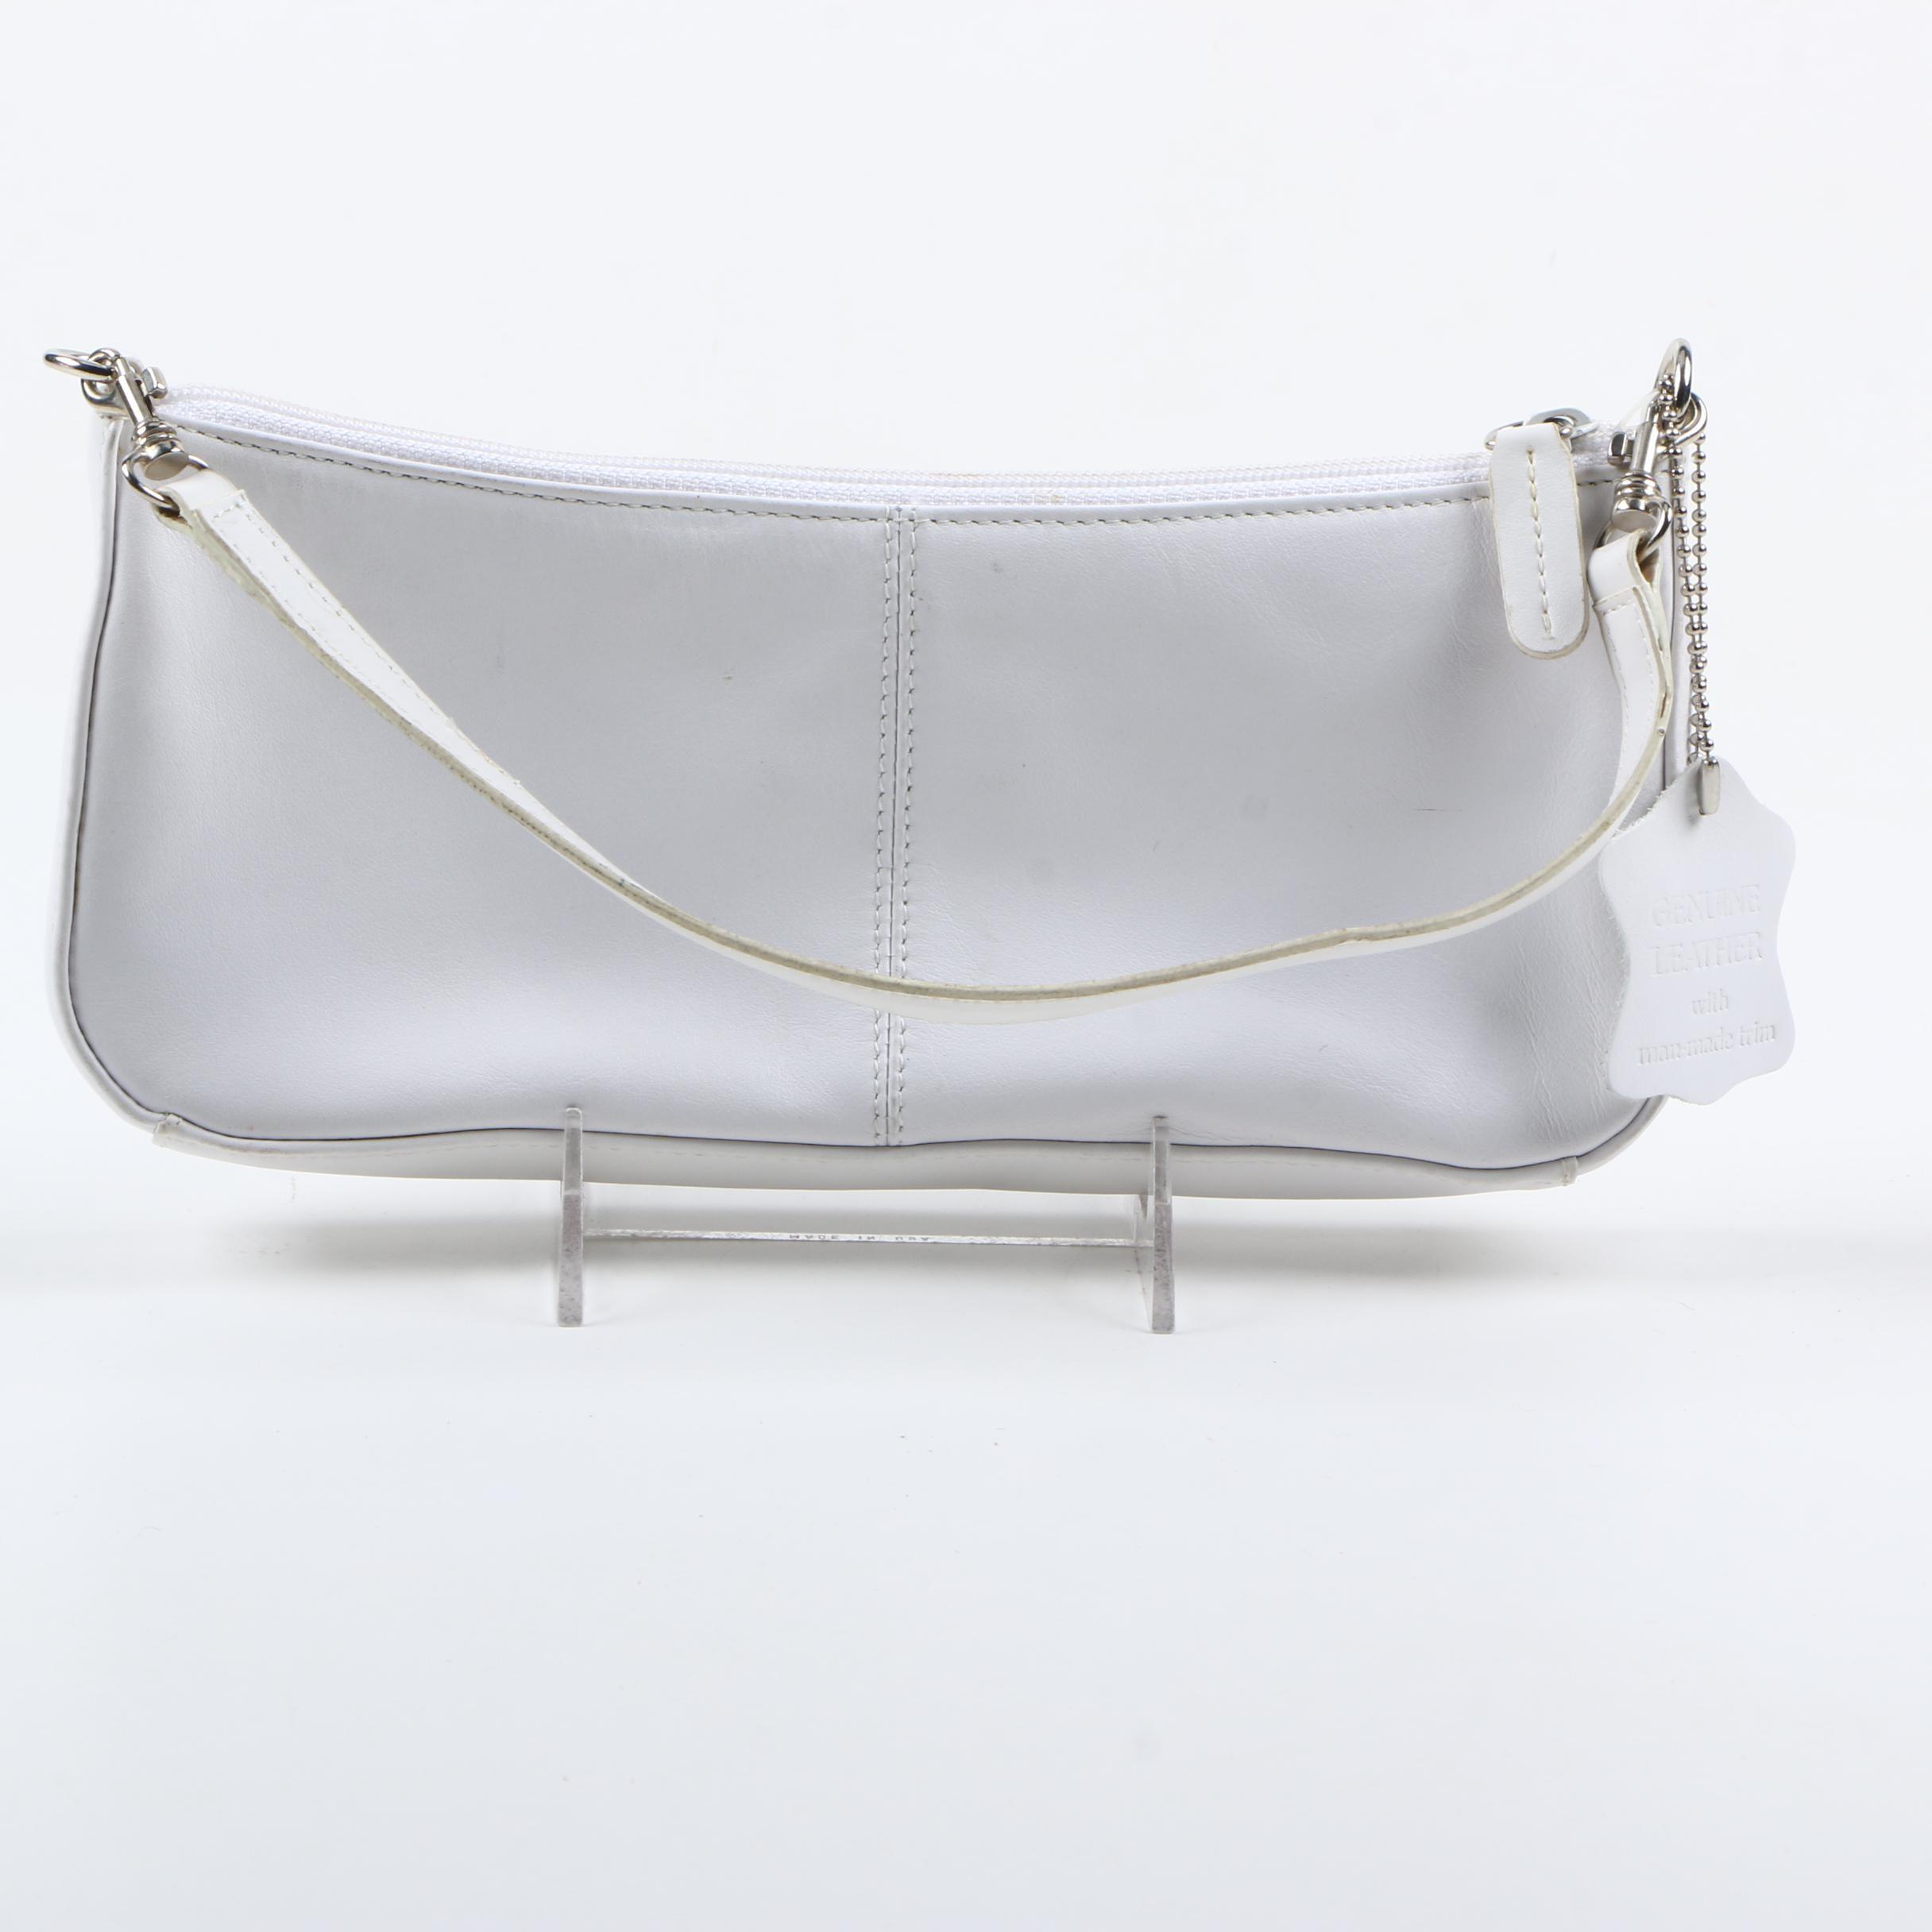 Giani Bernini Leather Handbag and Zipper Wallet